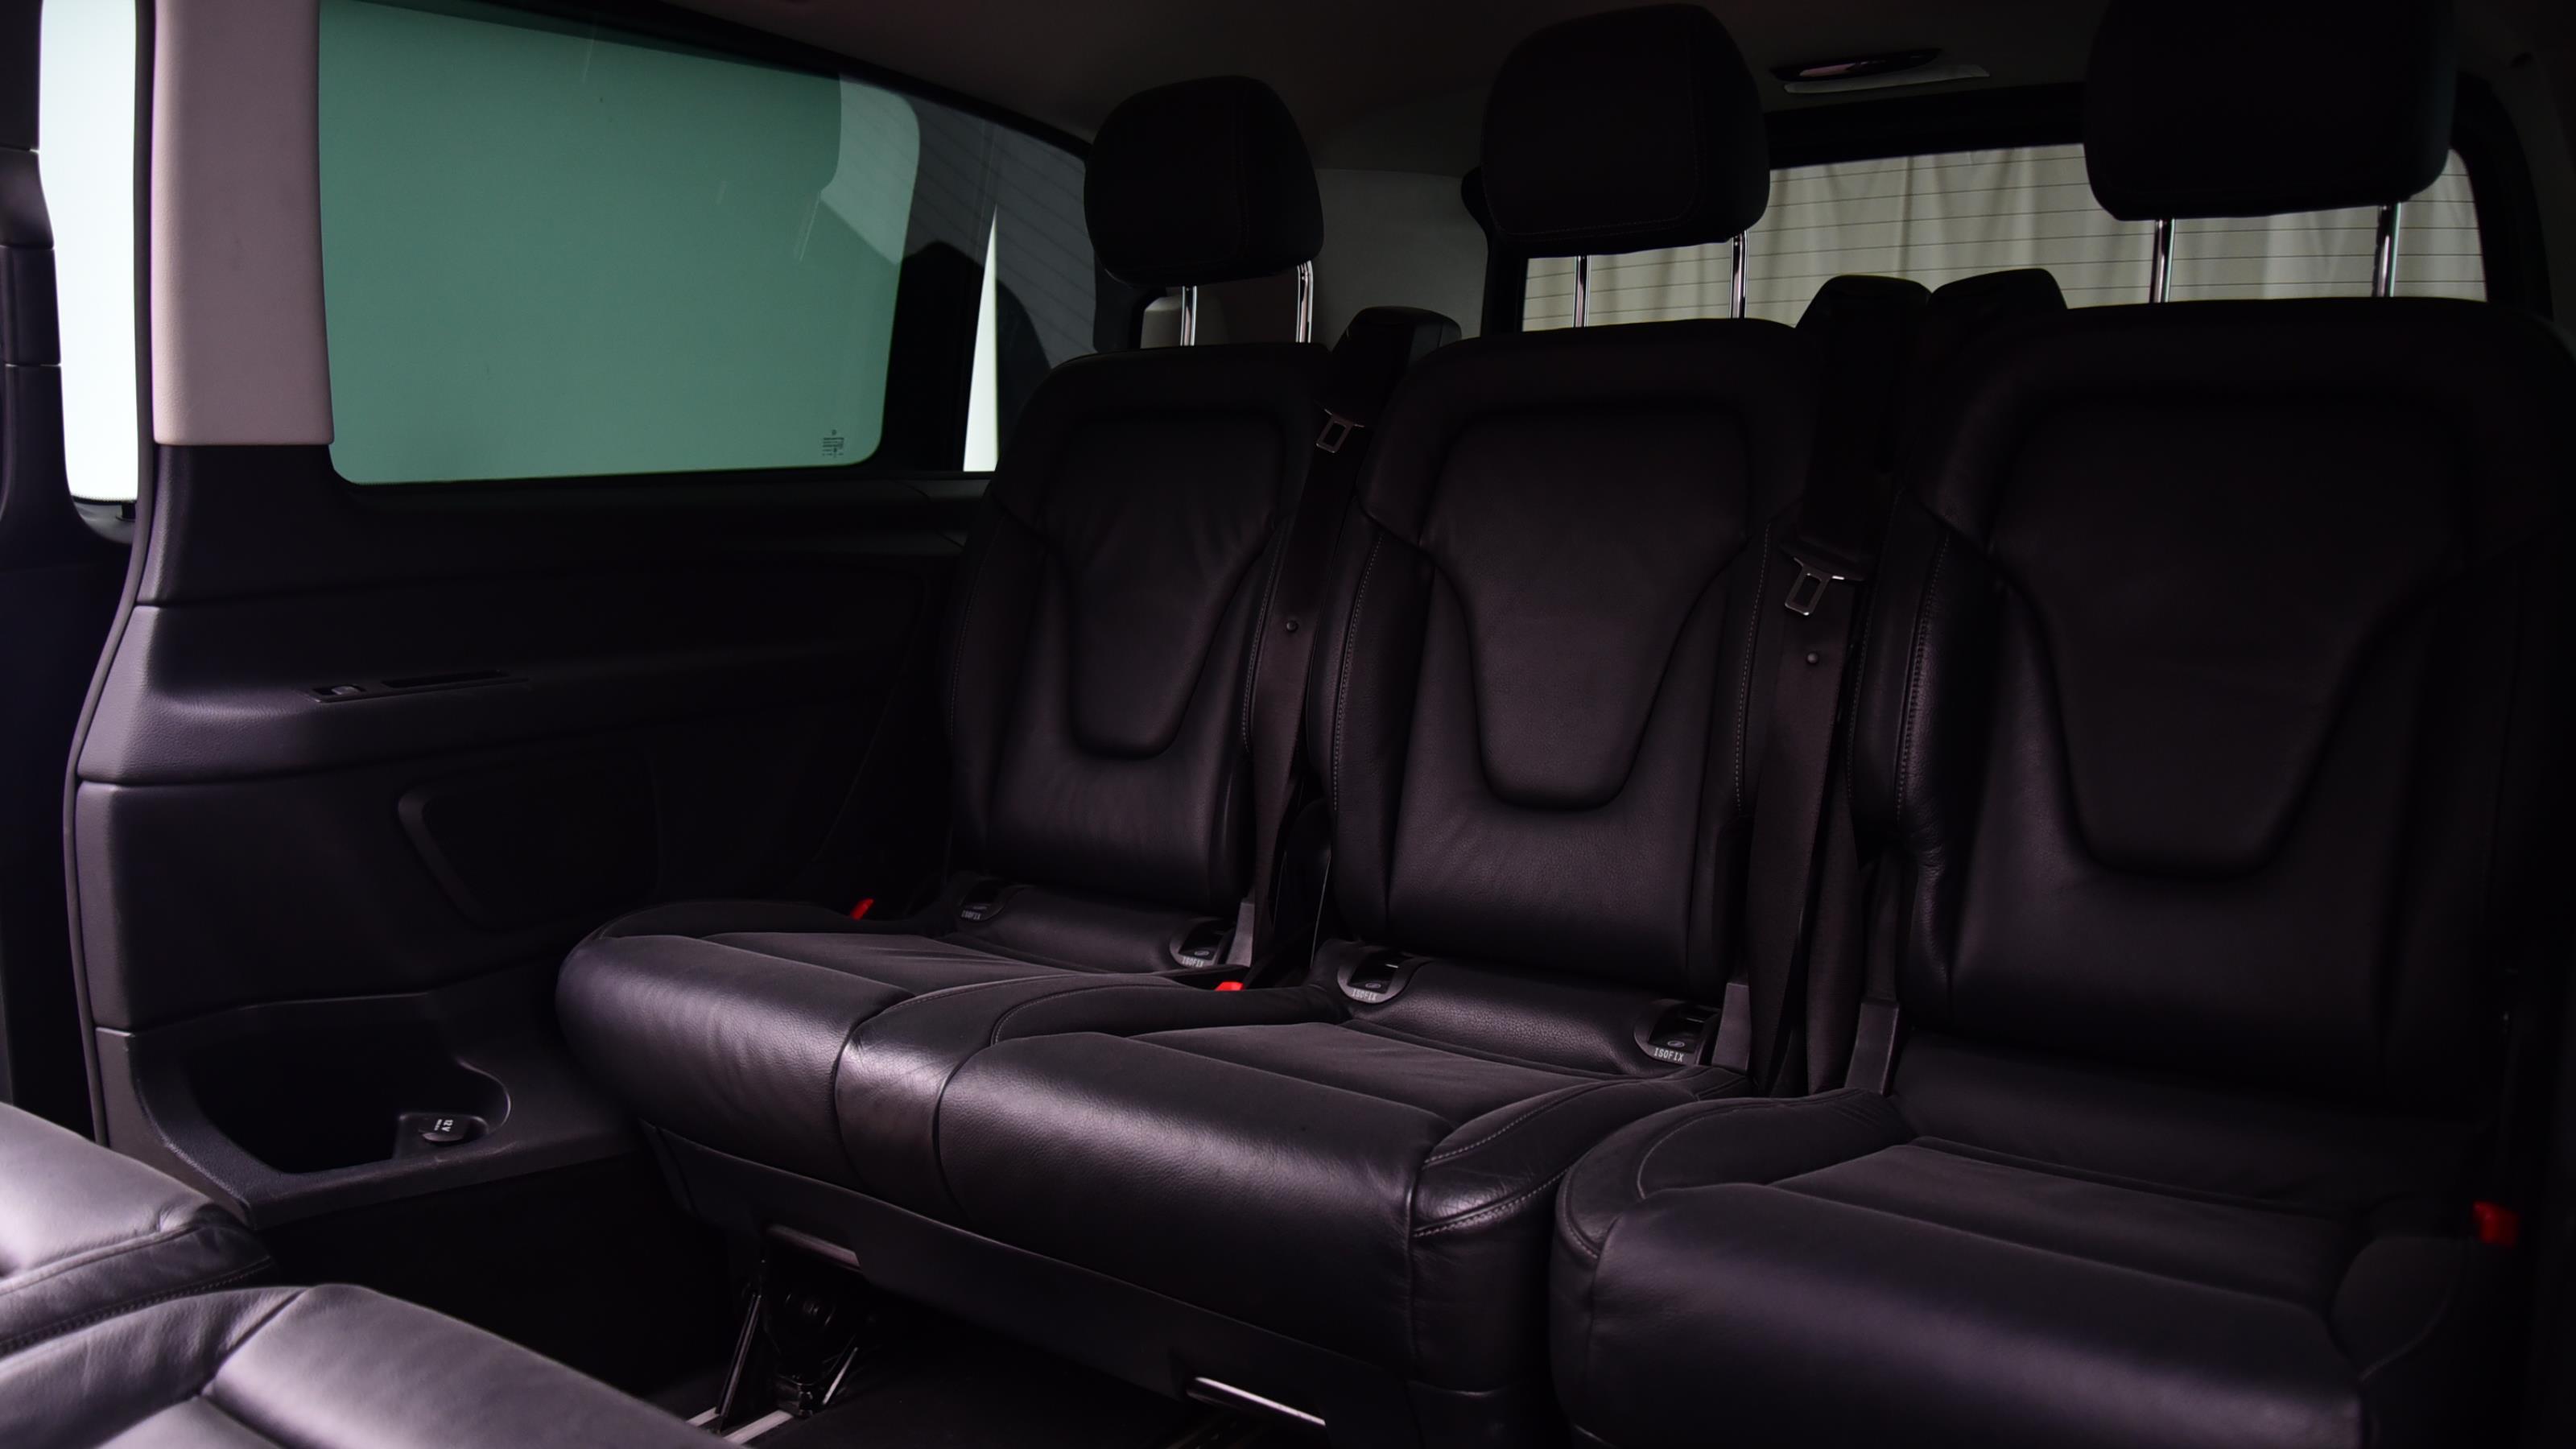 Used 2016 Mercedes-Benz V CLASS V220 BlueTEC SE 5dr Auto Black at Saxton4x4